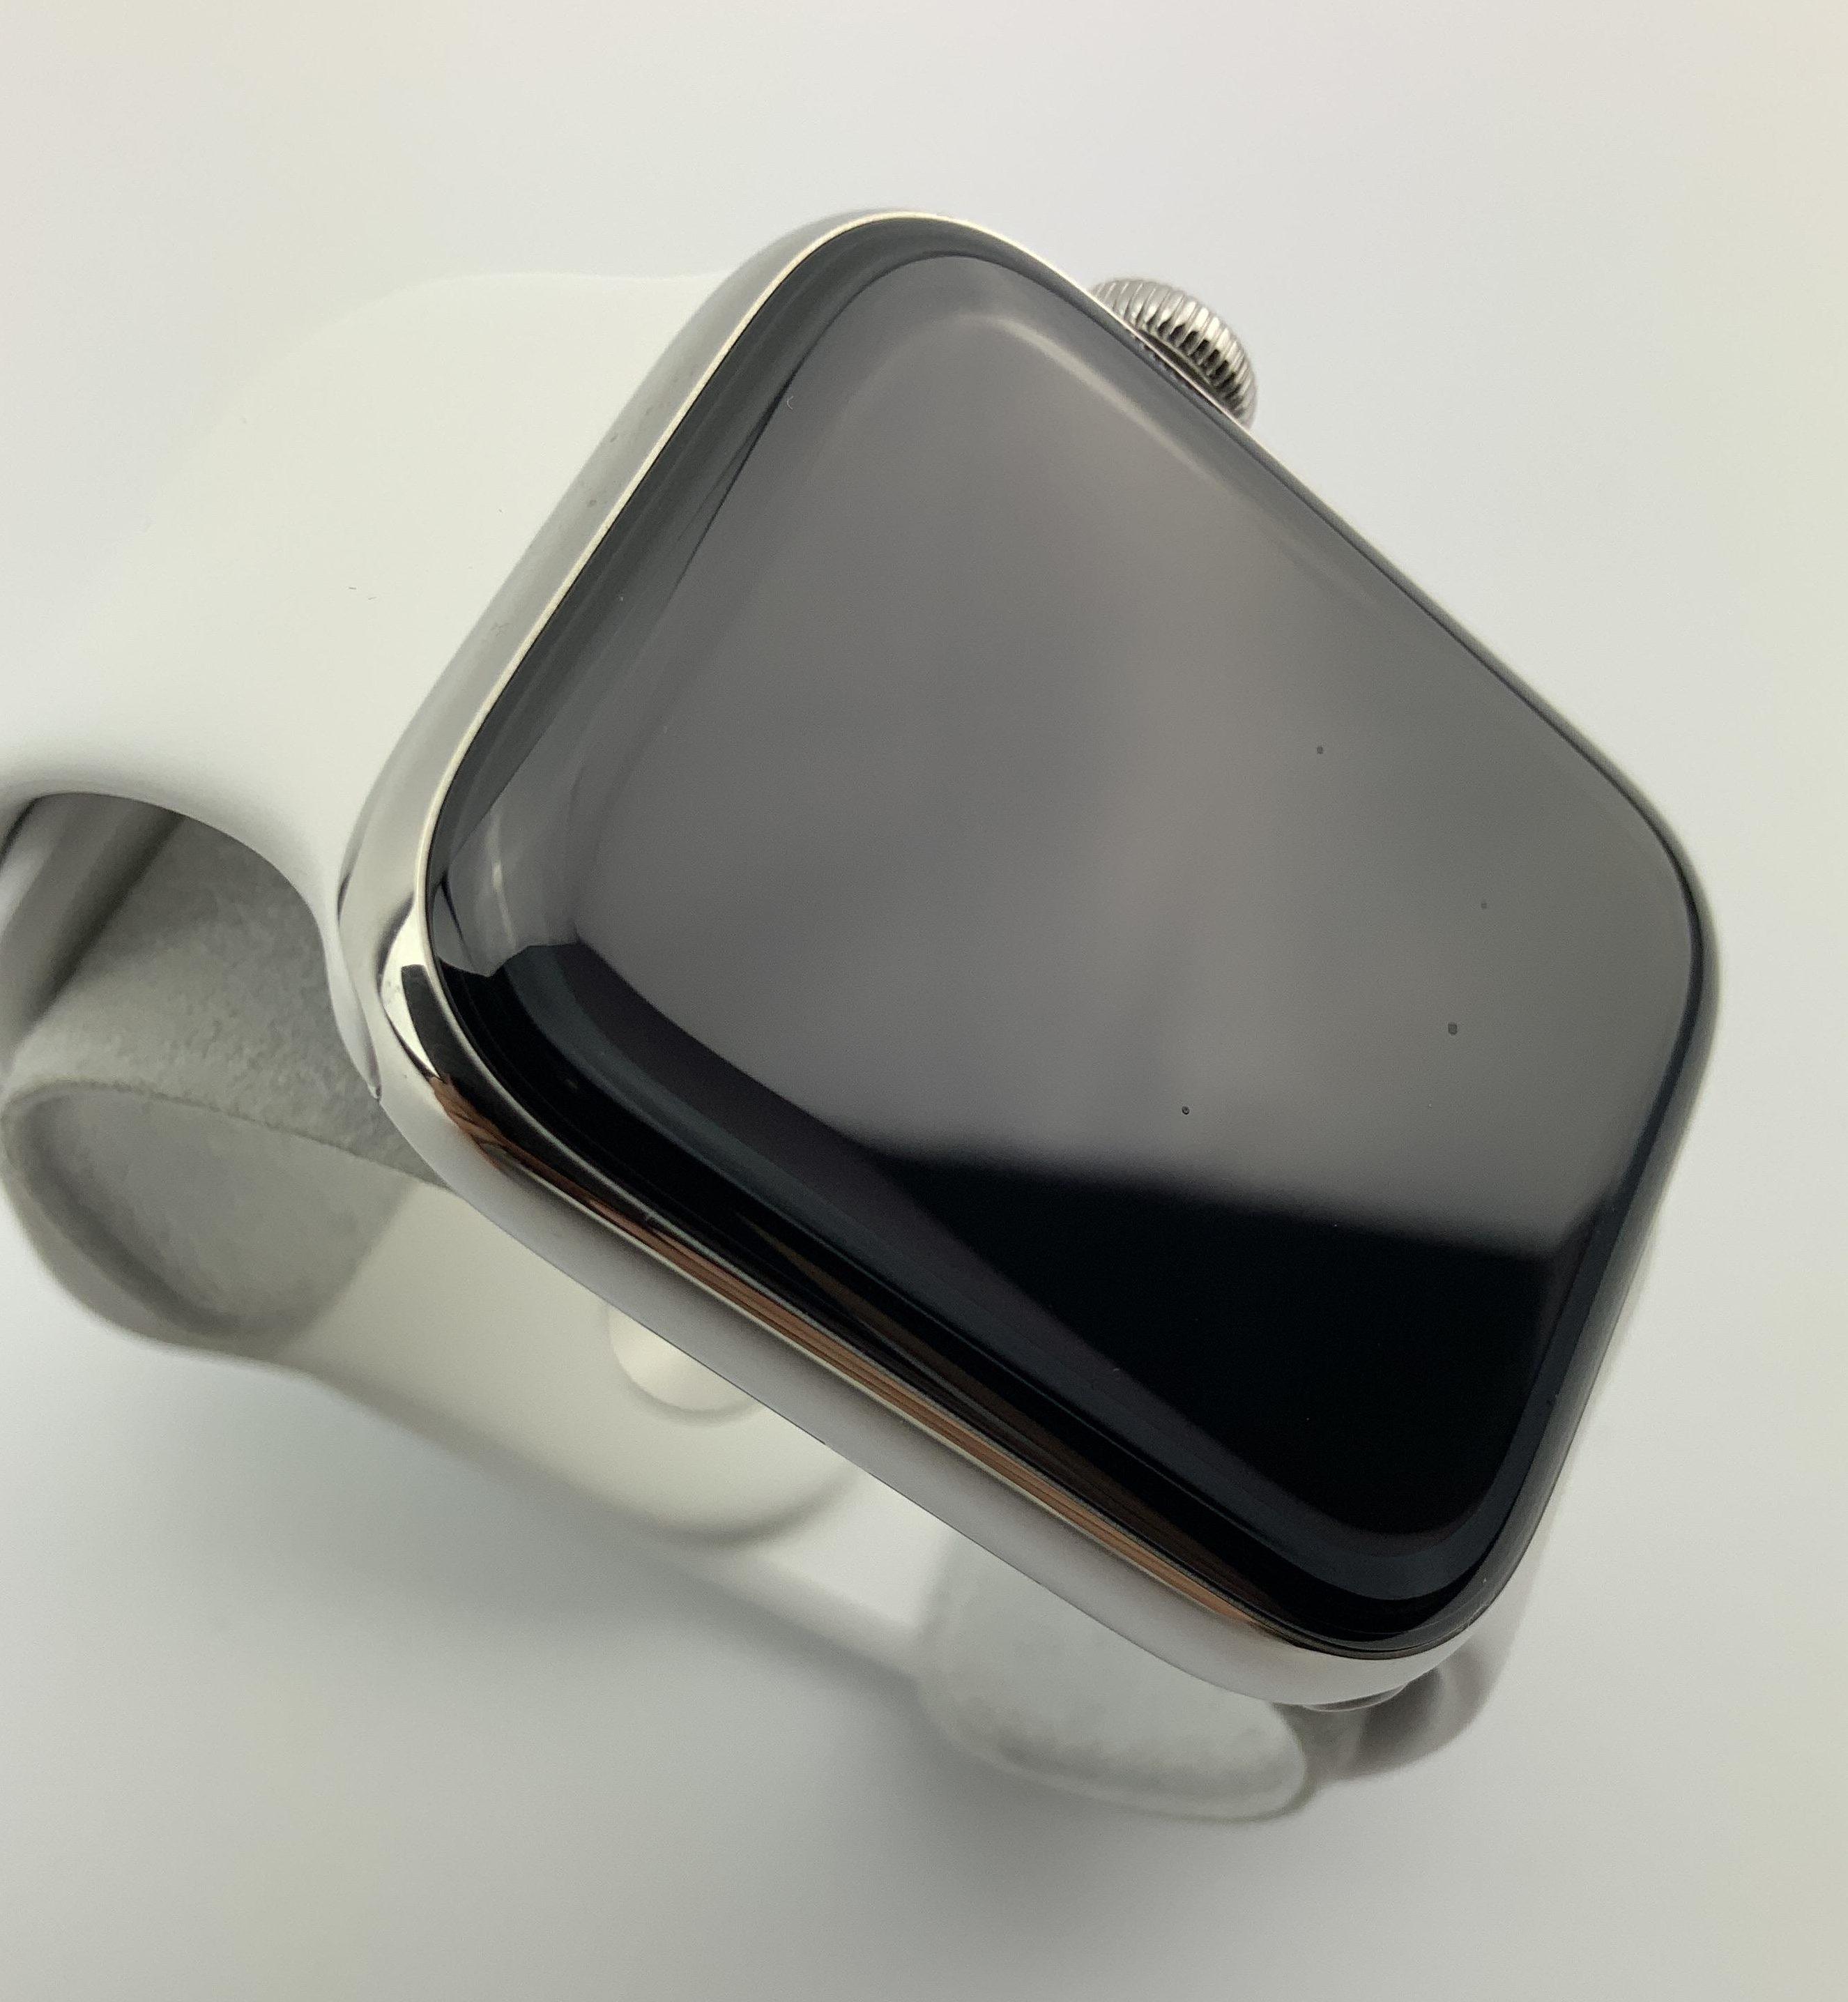 Watch Series 5 Steel Cellular (44mm), Silver, Afbeelding 2